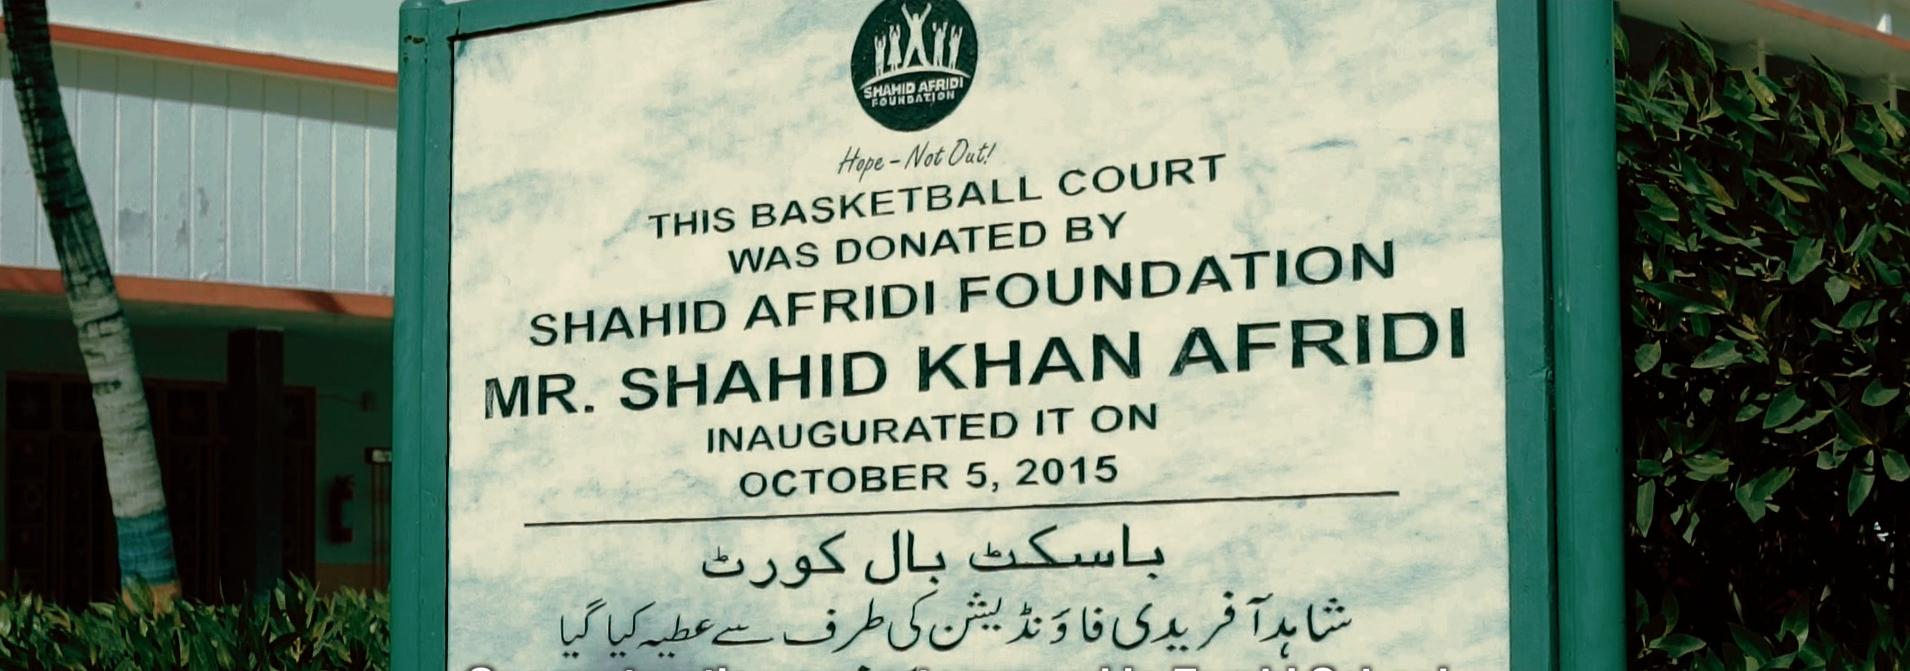 ShahidAfridiFoundation_BCFGS.jpg